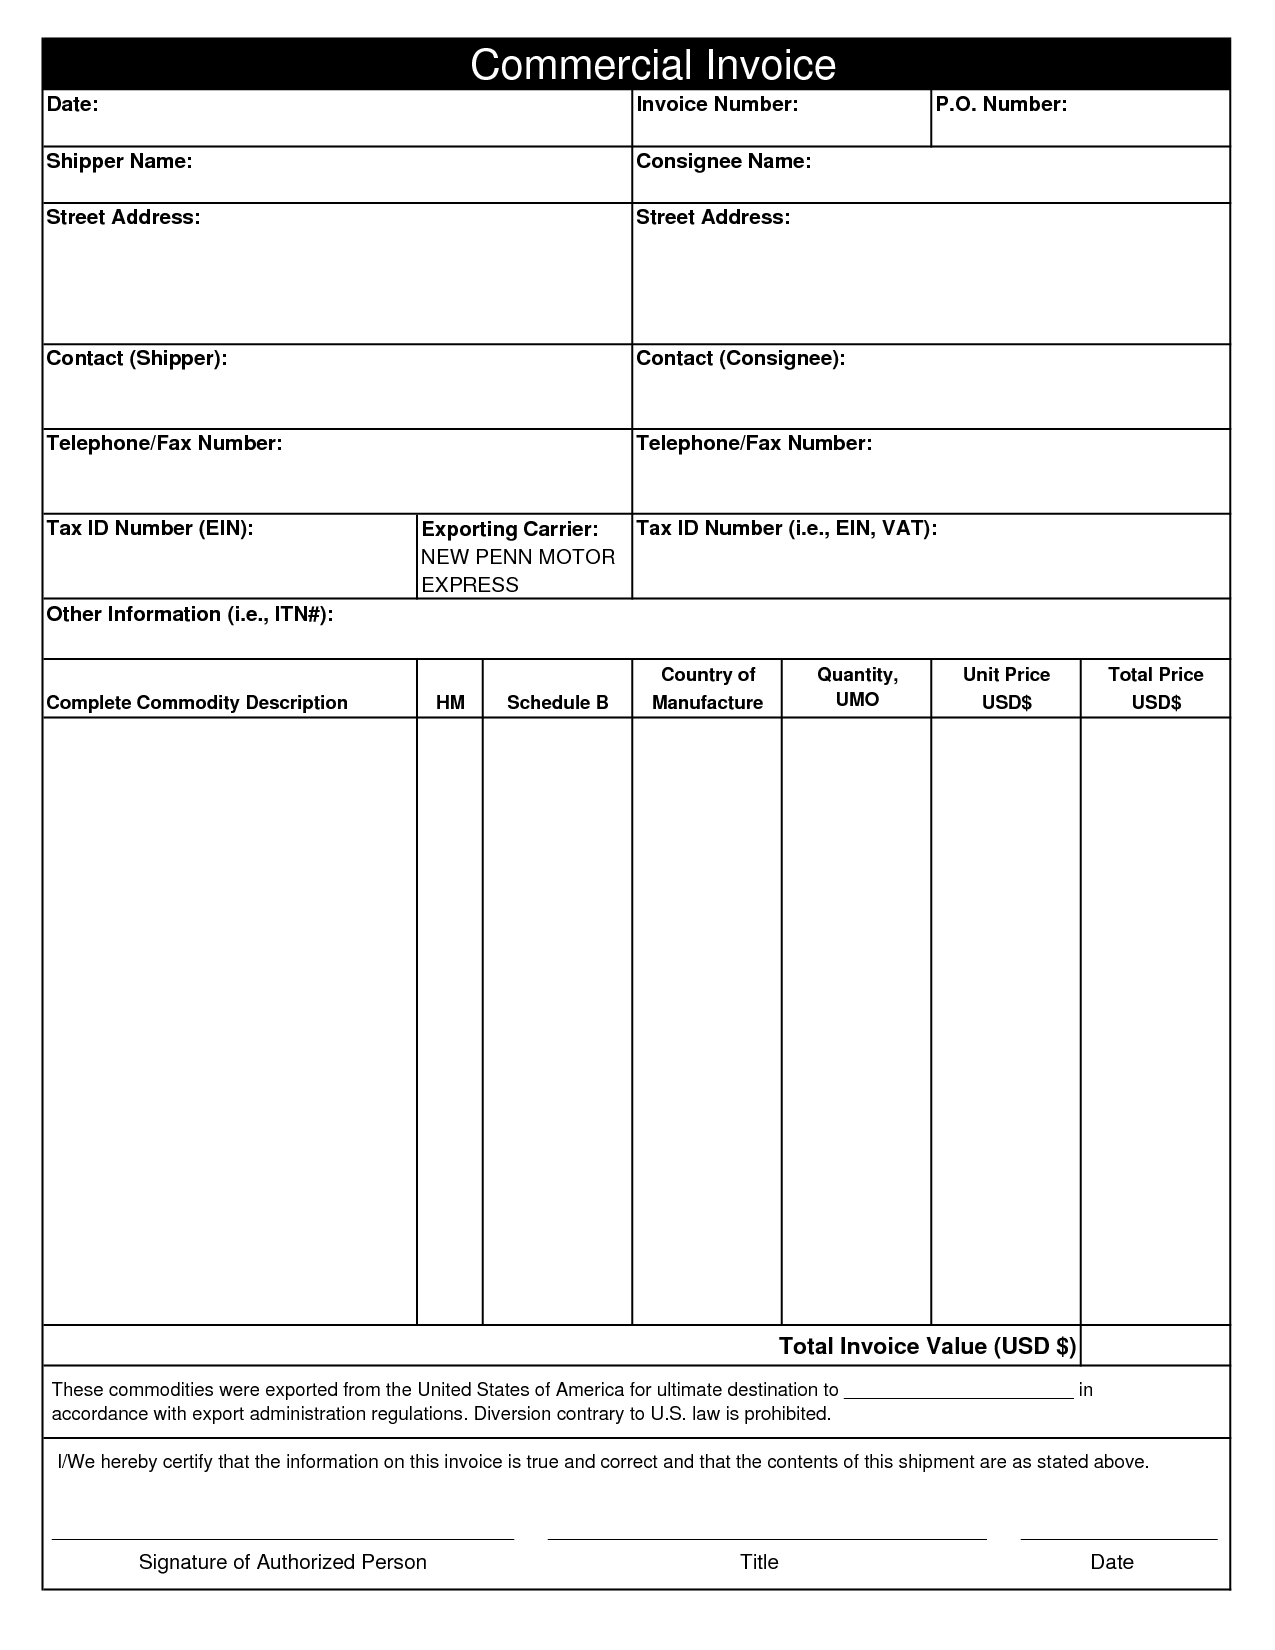 28 Blank Invoice Templates Free Premium Templates Commercial Invoice Template Free Invoice Example